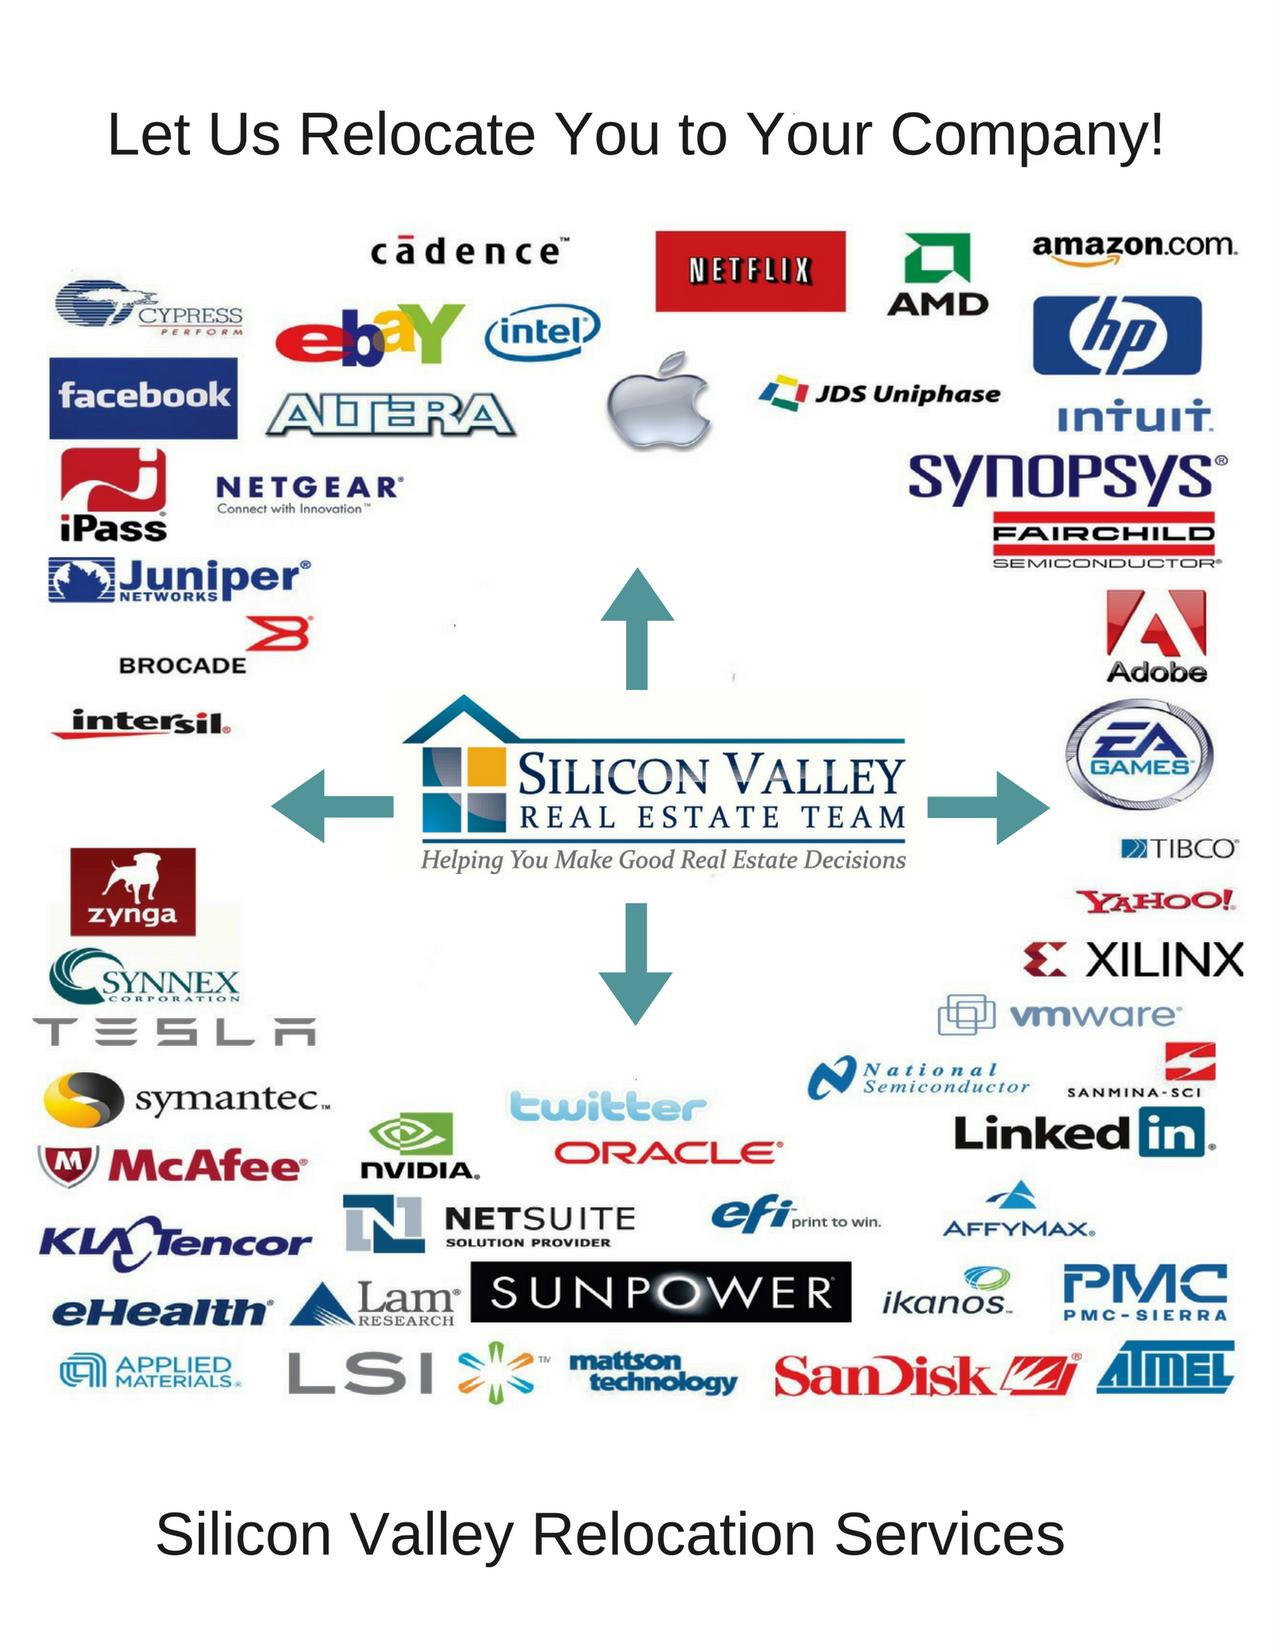 Silicon Valley Relocation Services | Corporate Relocation